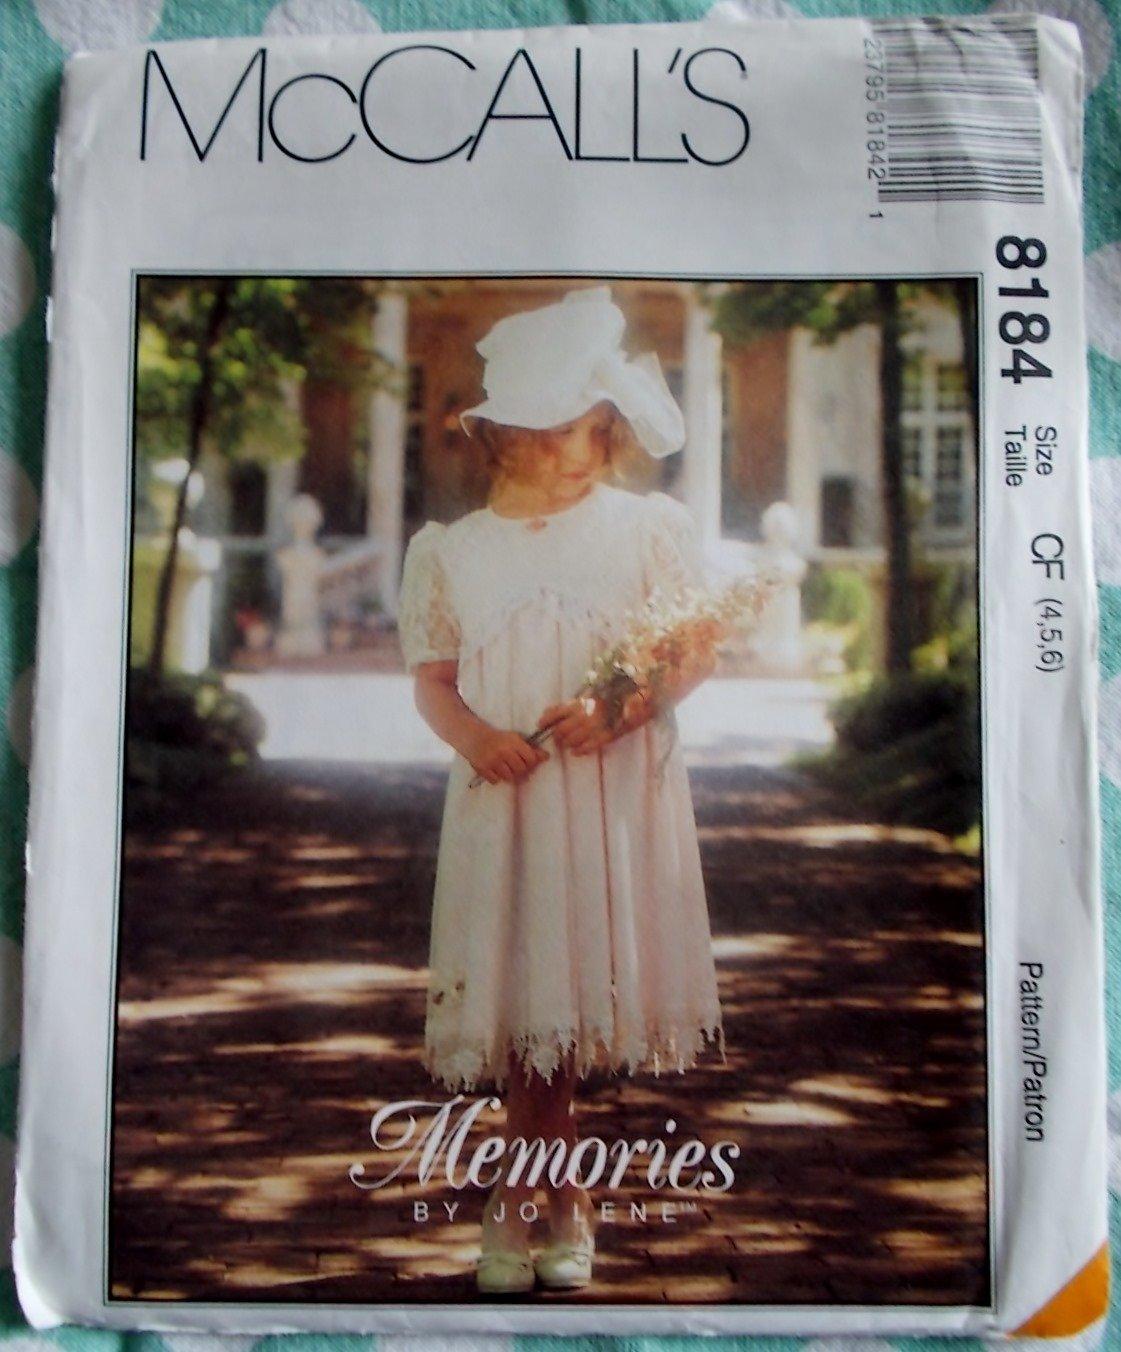 McCalls Memories by Jo Lene 8184 pattern, Childs Dress, Sizes 4, 5, 6, UNCUT